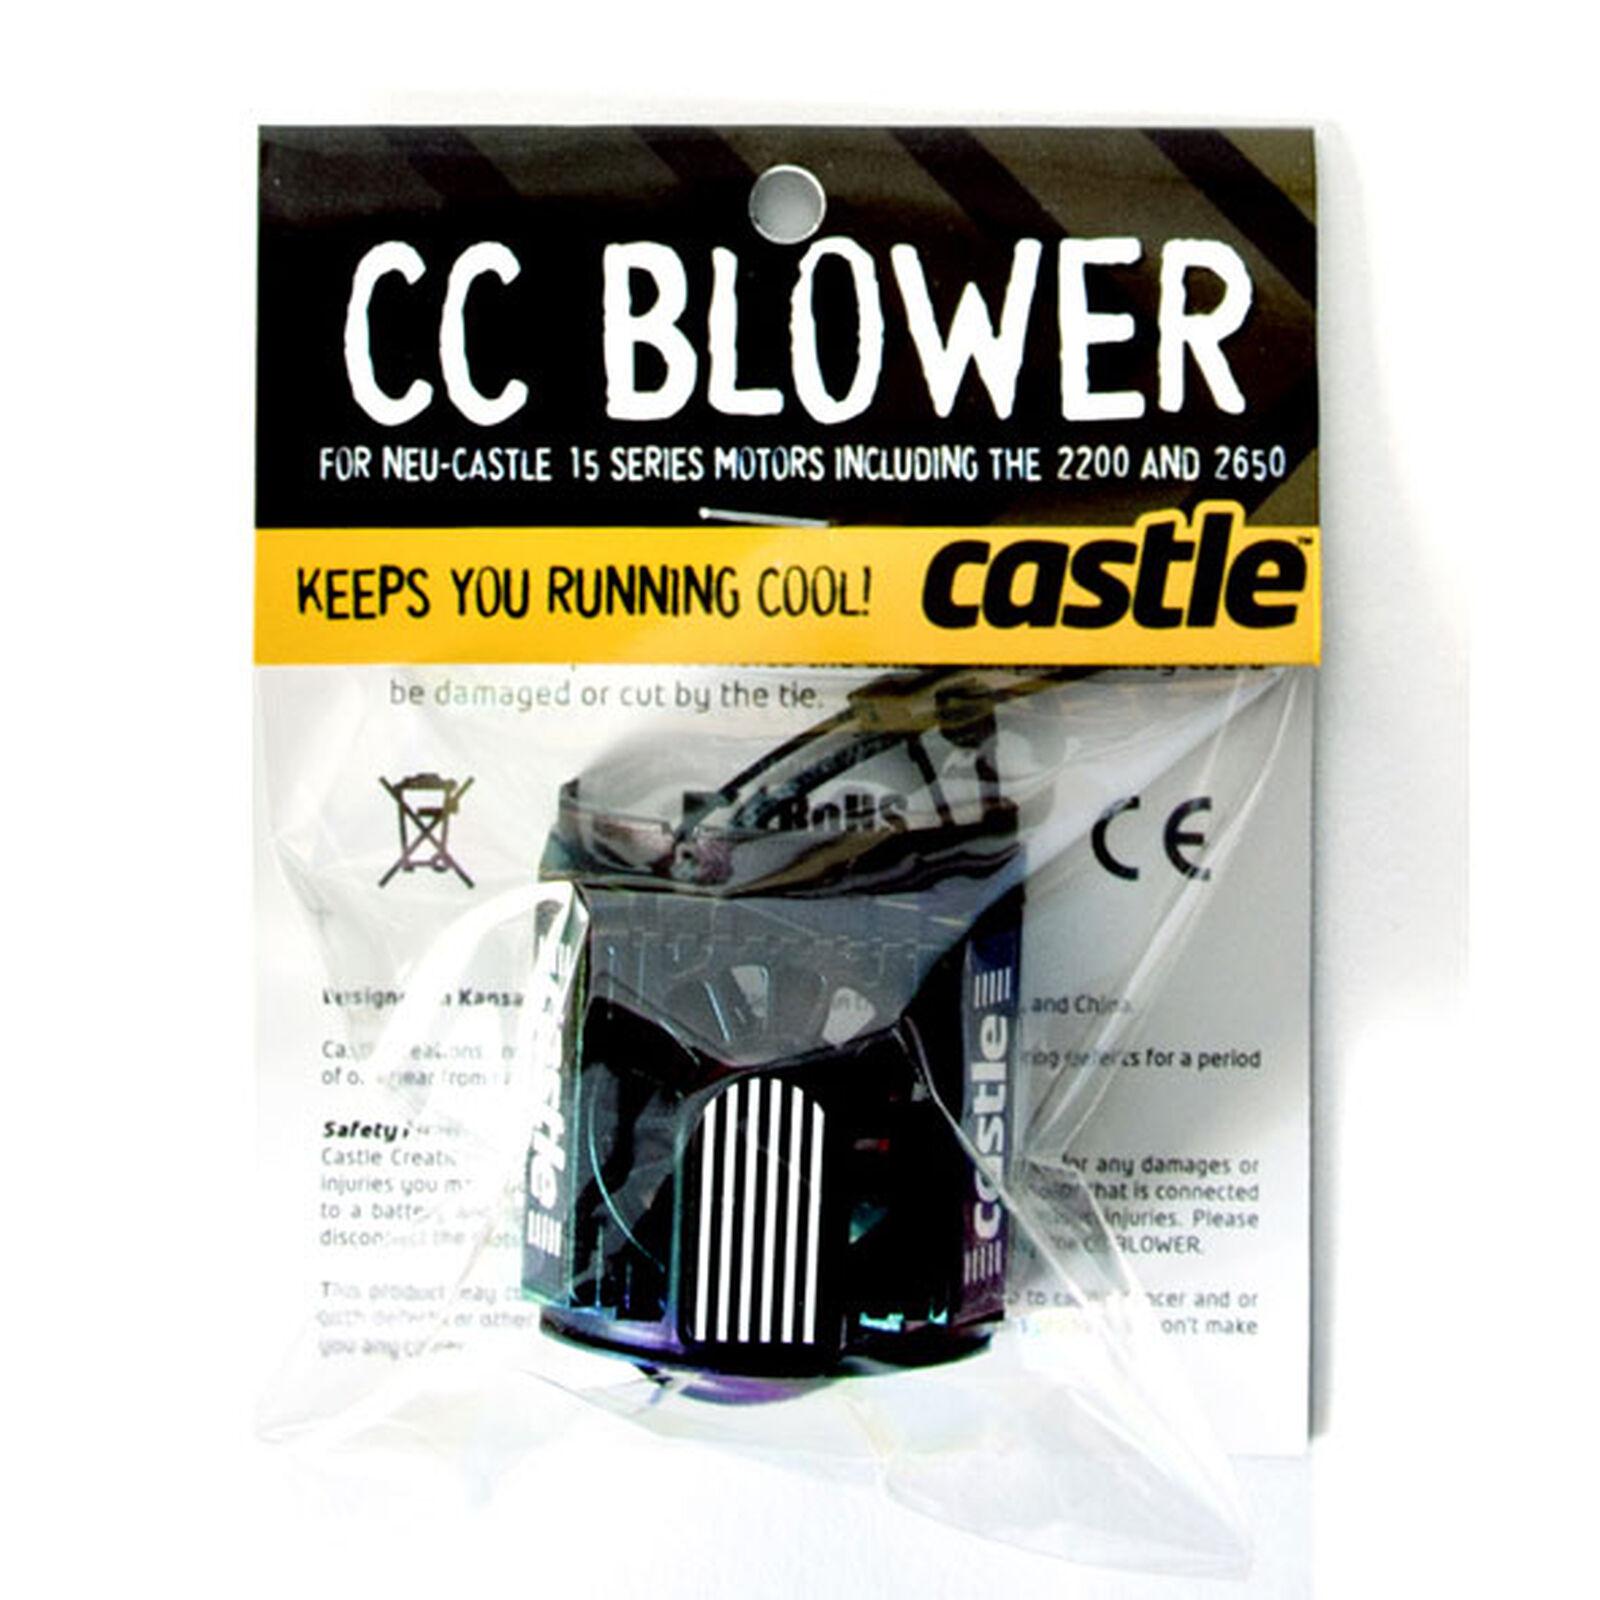 CC Blower 1/8: All 15 Series